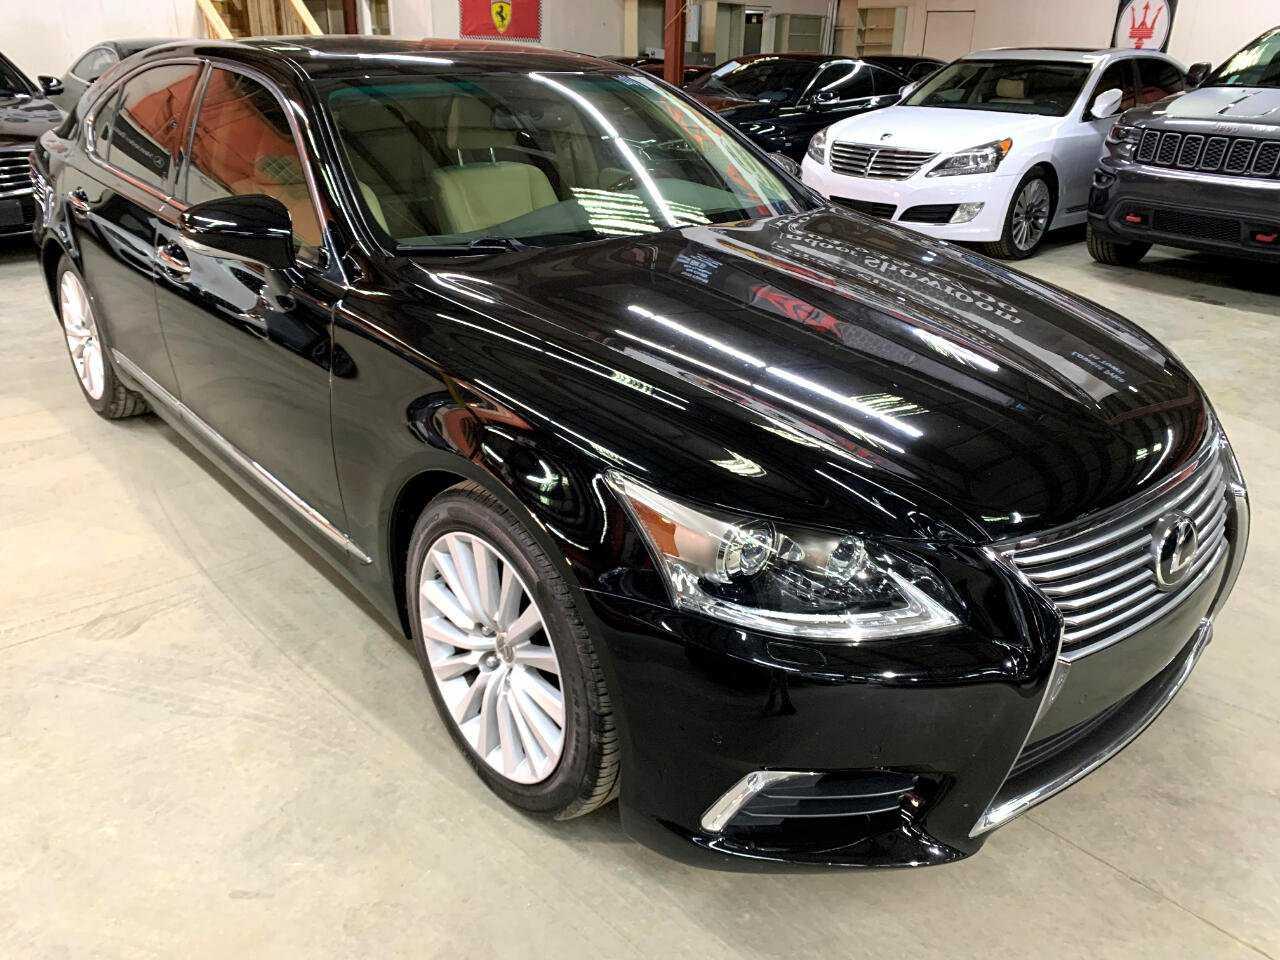 New black Lexus 3/4 front view